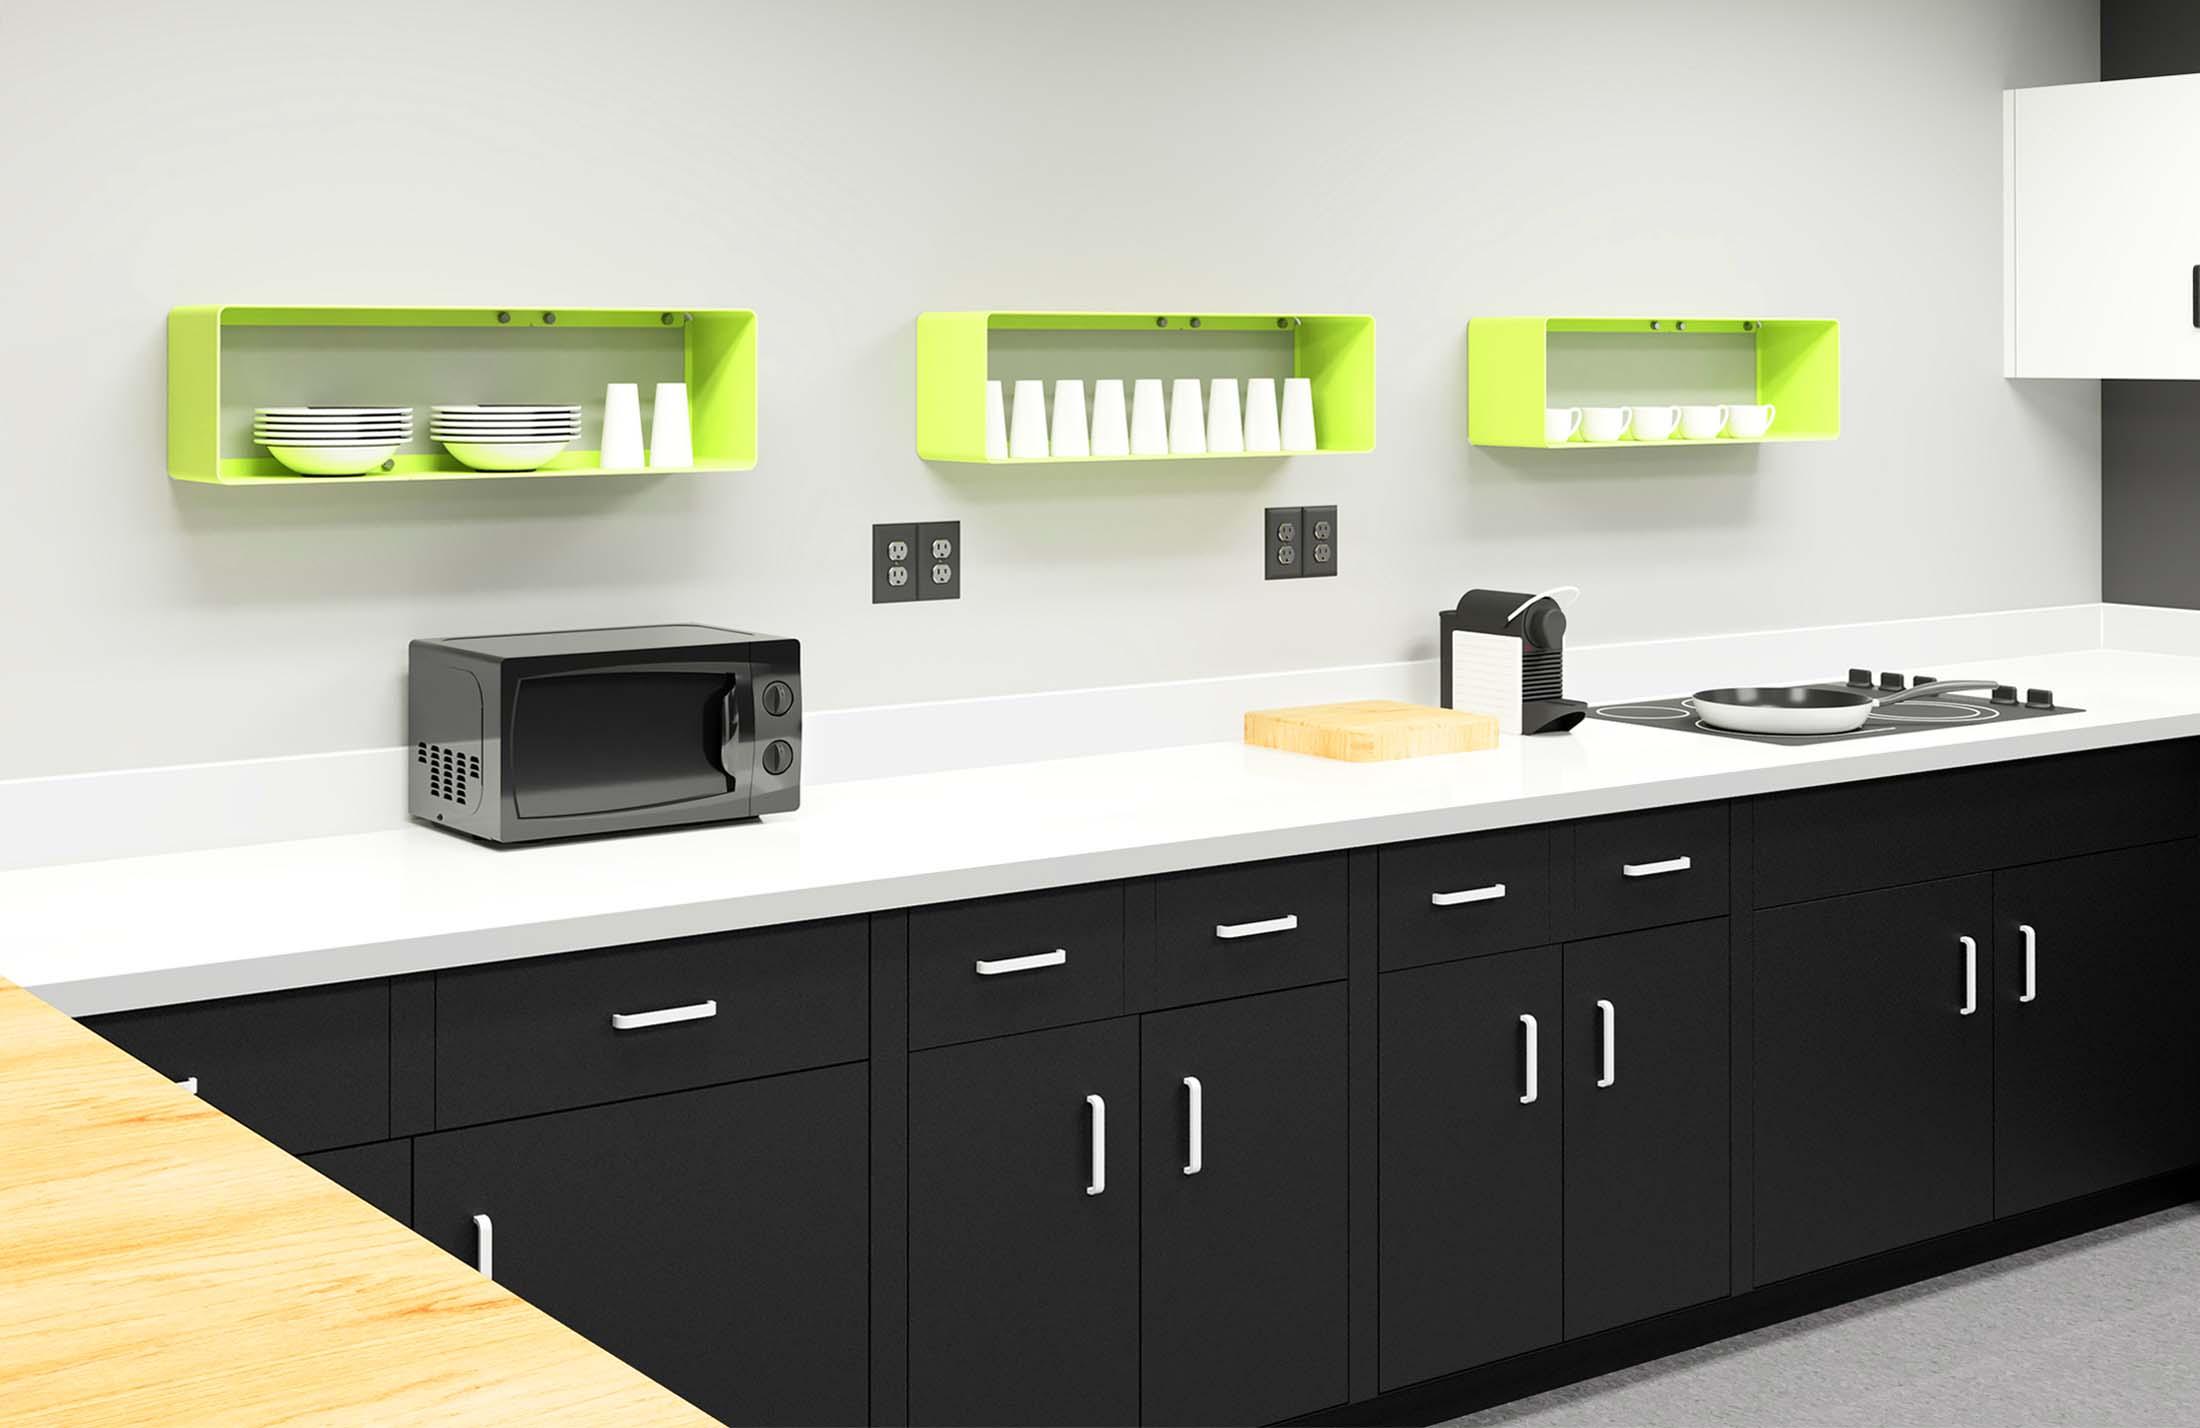 Kitchen_Design_2018-Jun-05_03-29-42PM-000_CustomizedView9530175720_jpg.jpg